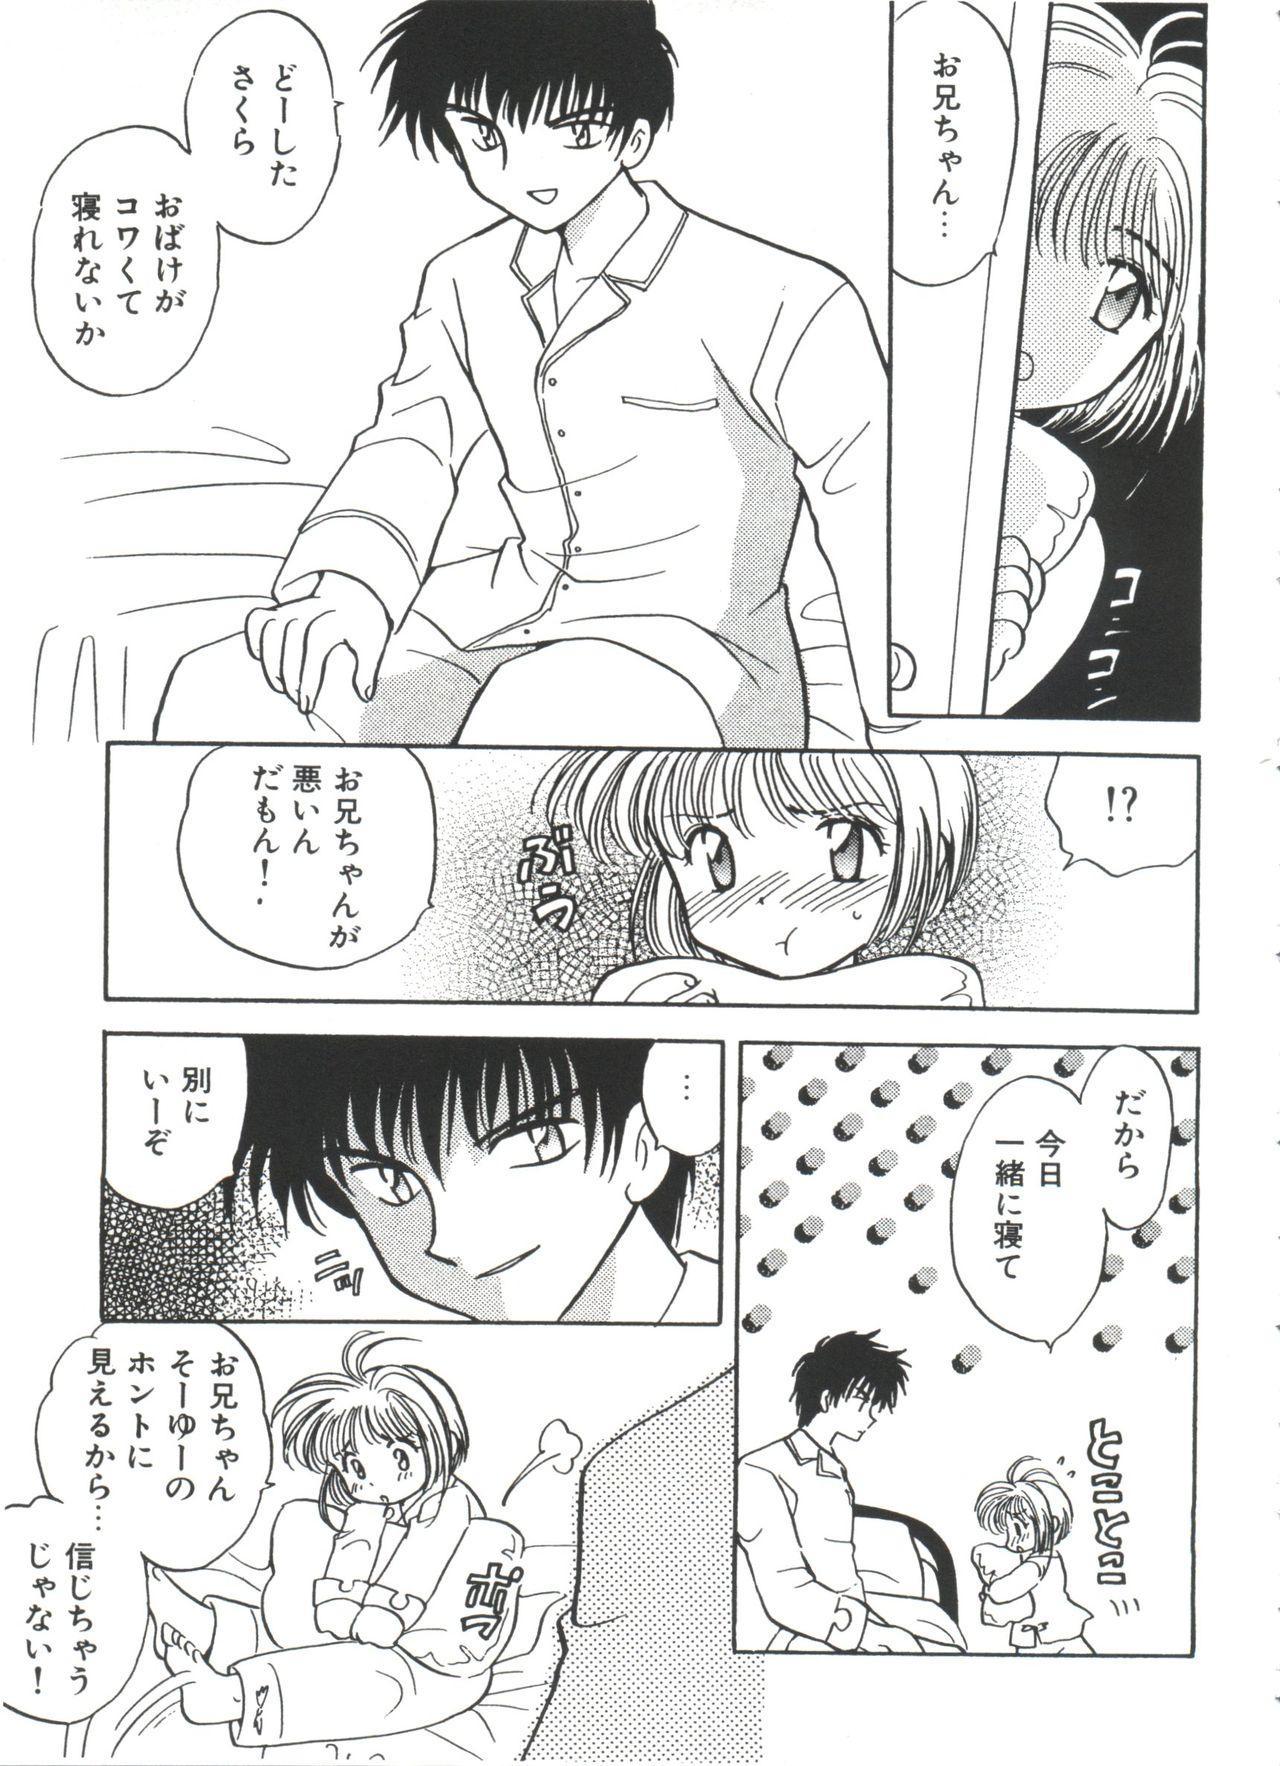 Ero-chan to Issho 2 24